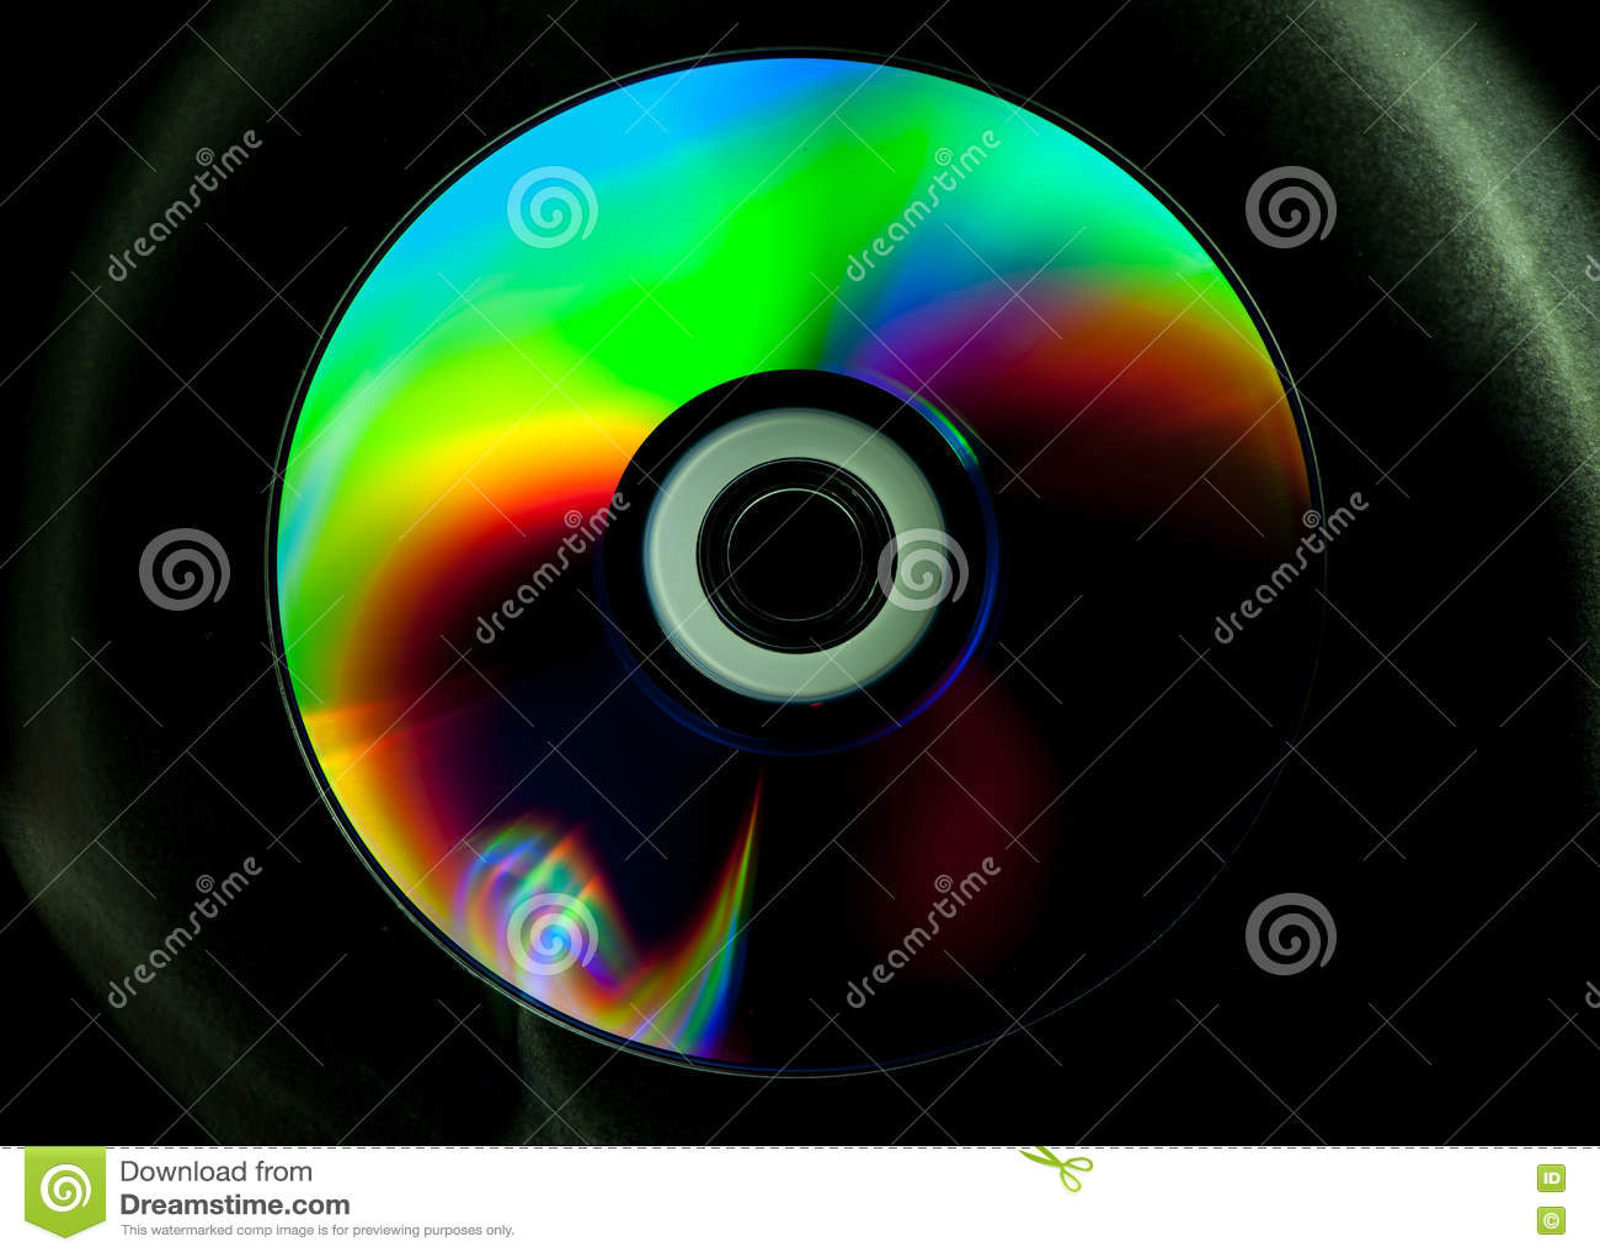 Disque de CD et de DVD